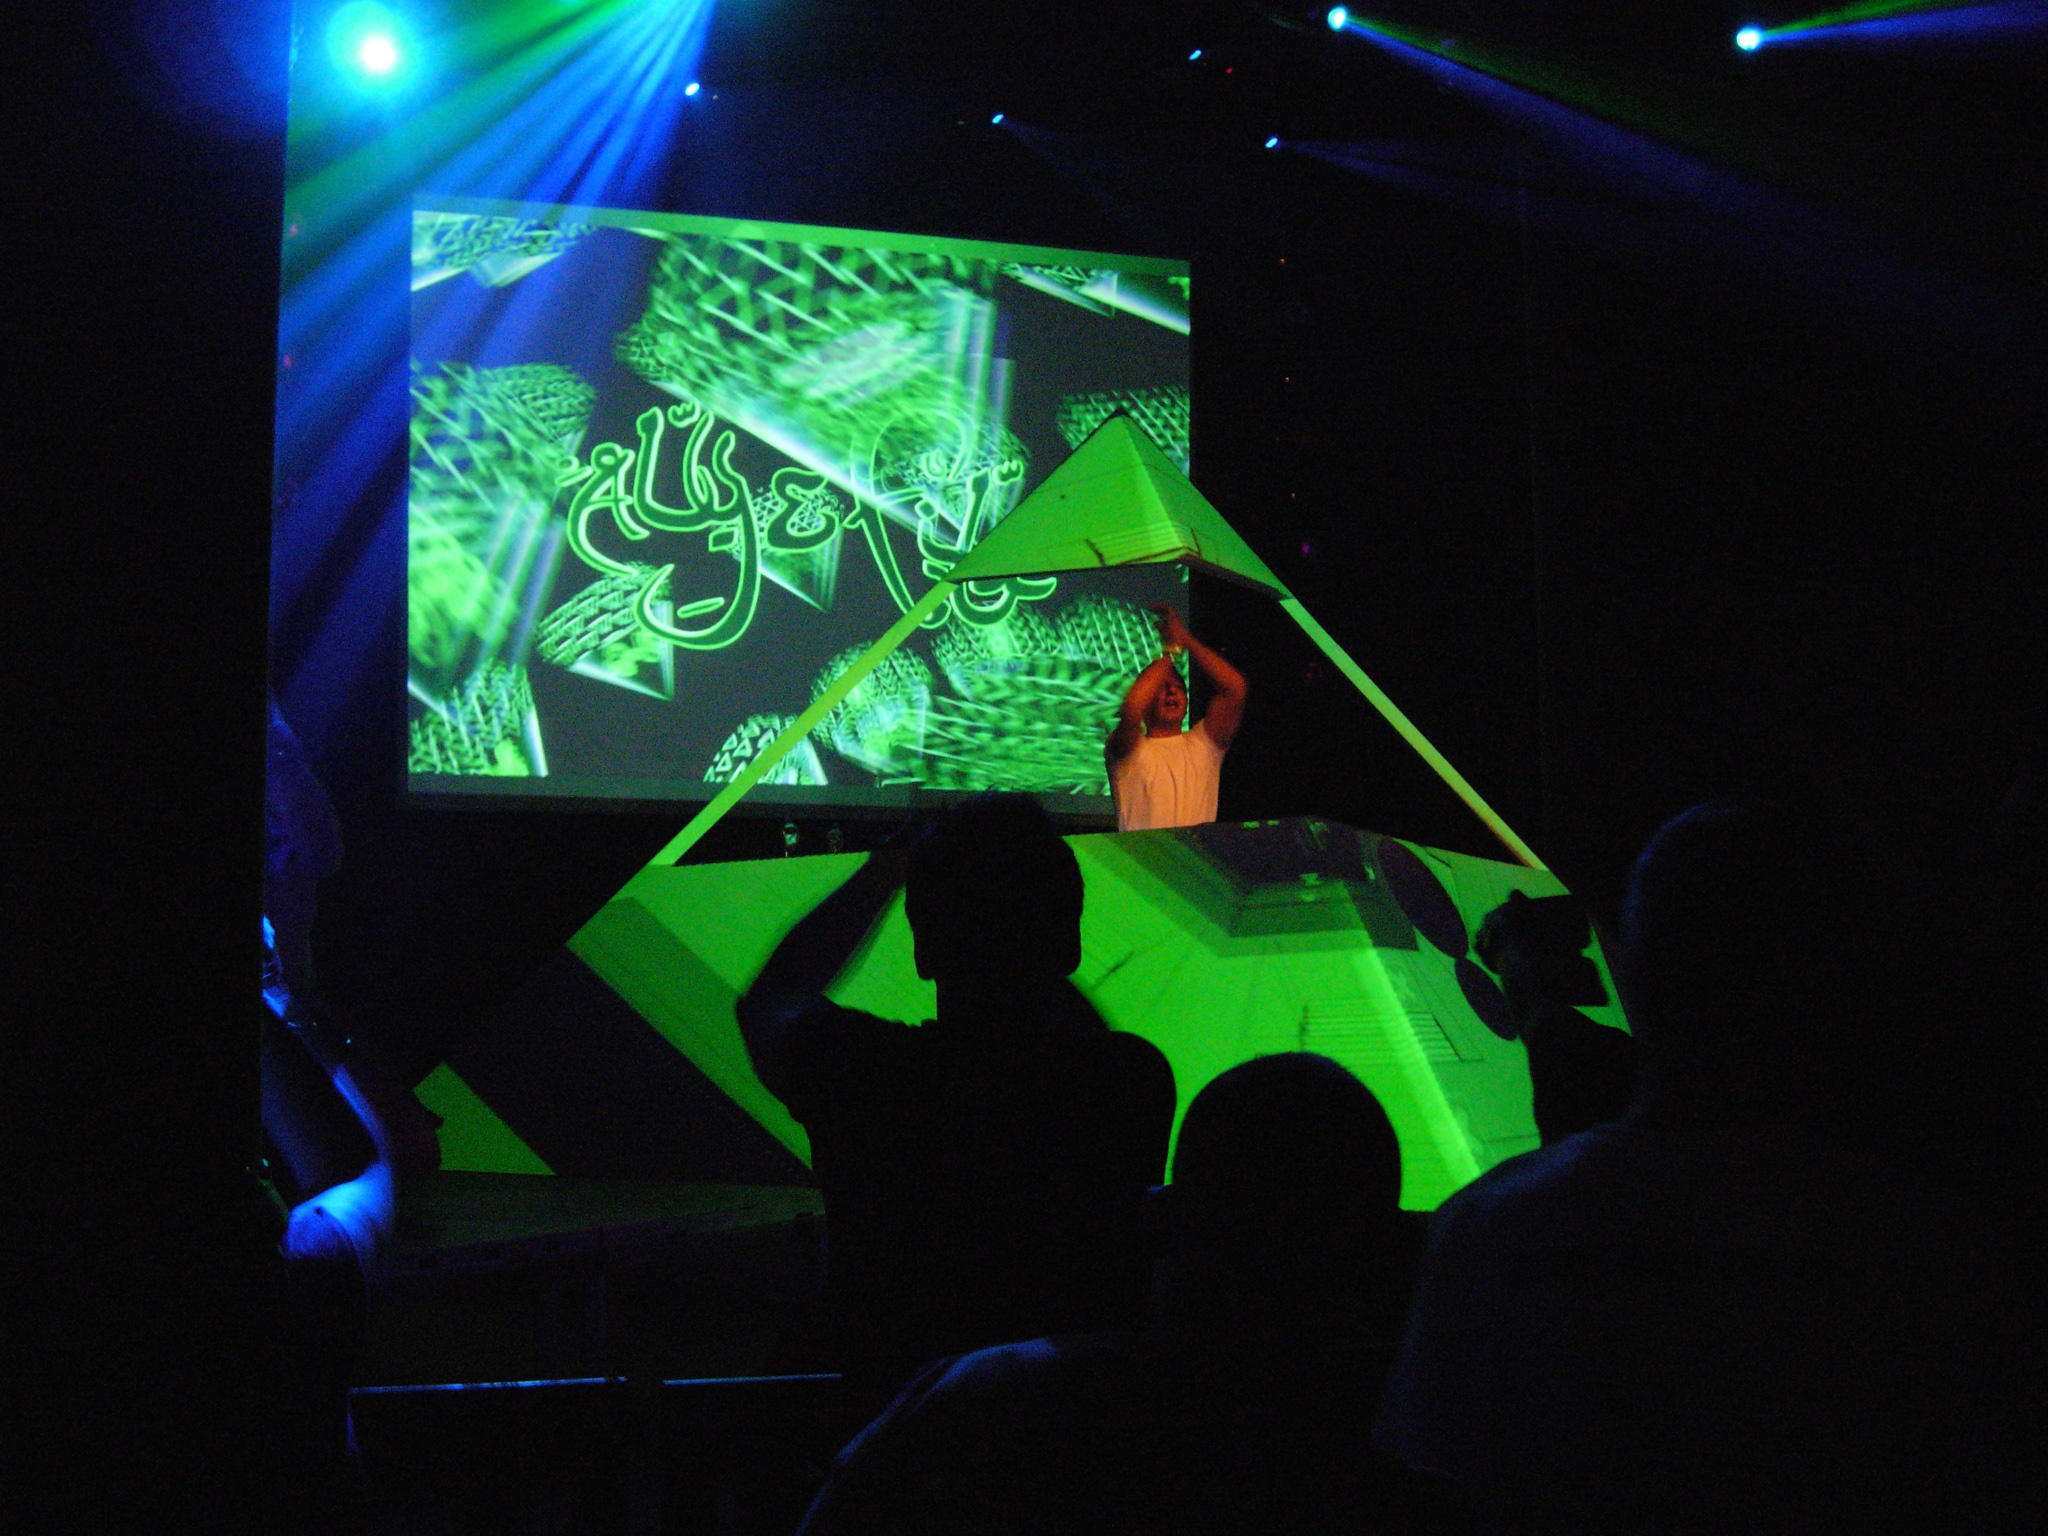 The Future Sound of Egypt 300 live at SaSaZu in Prague